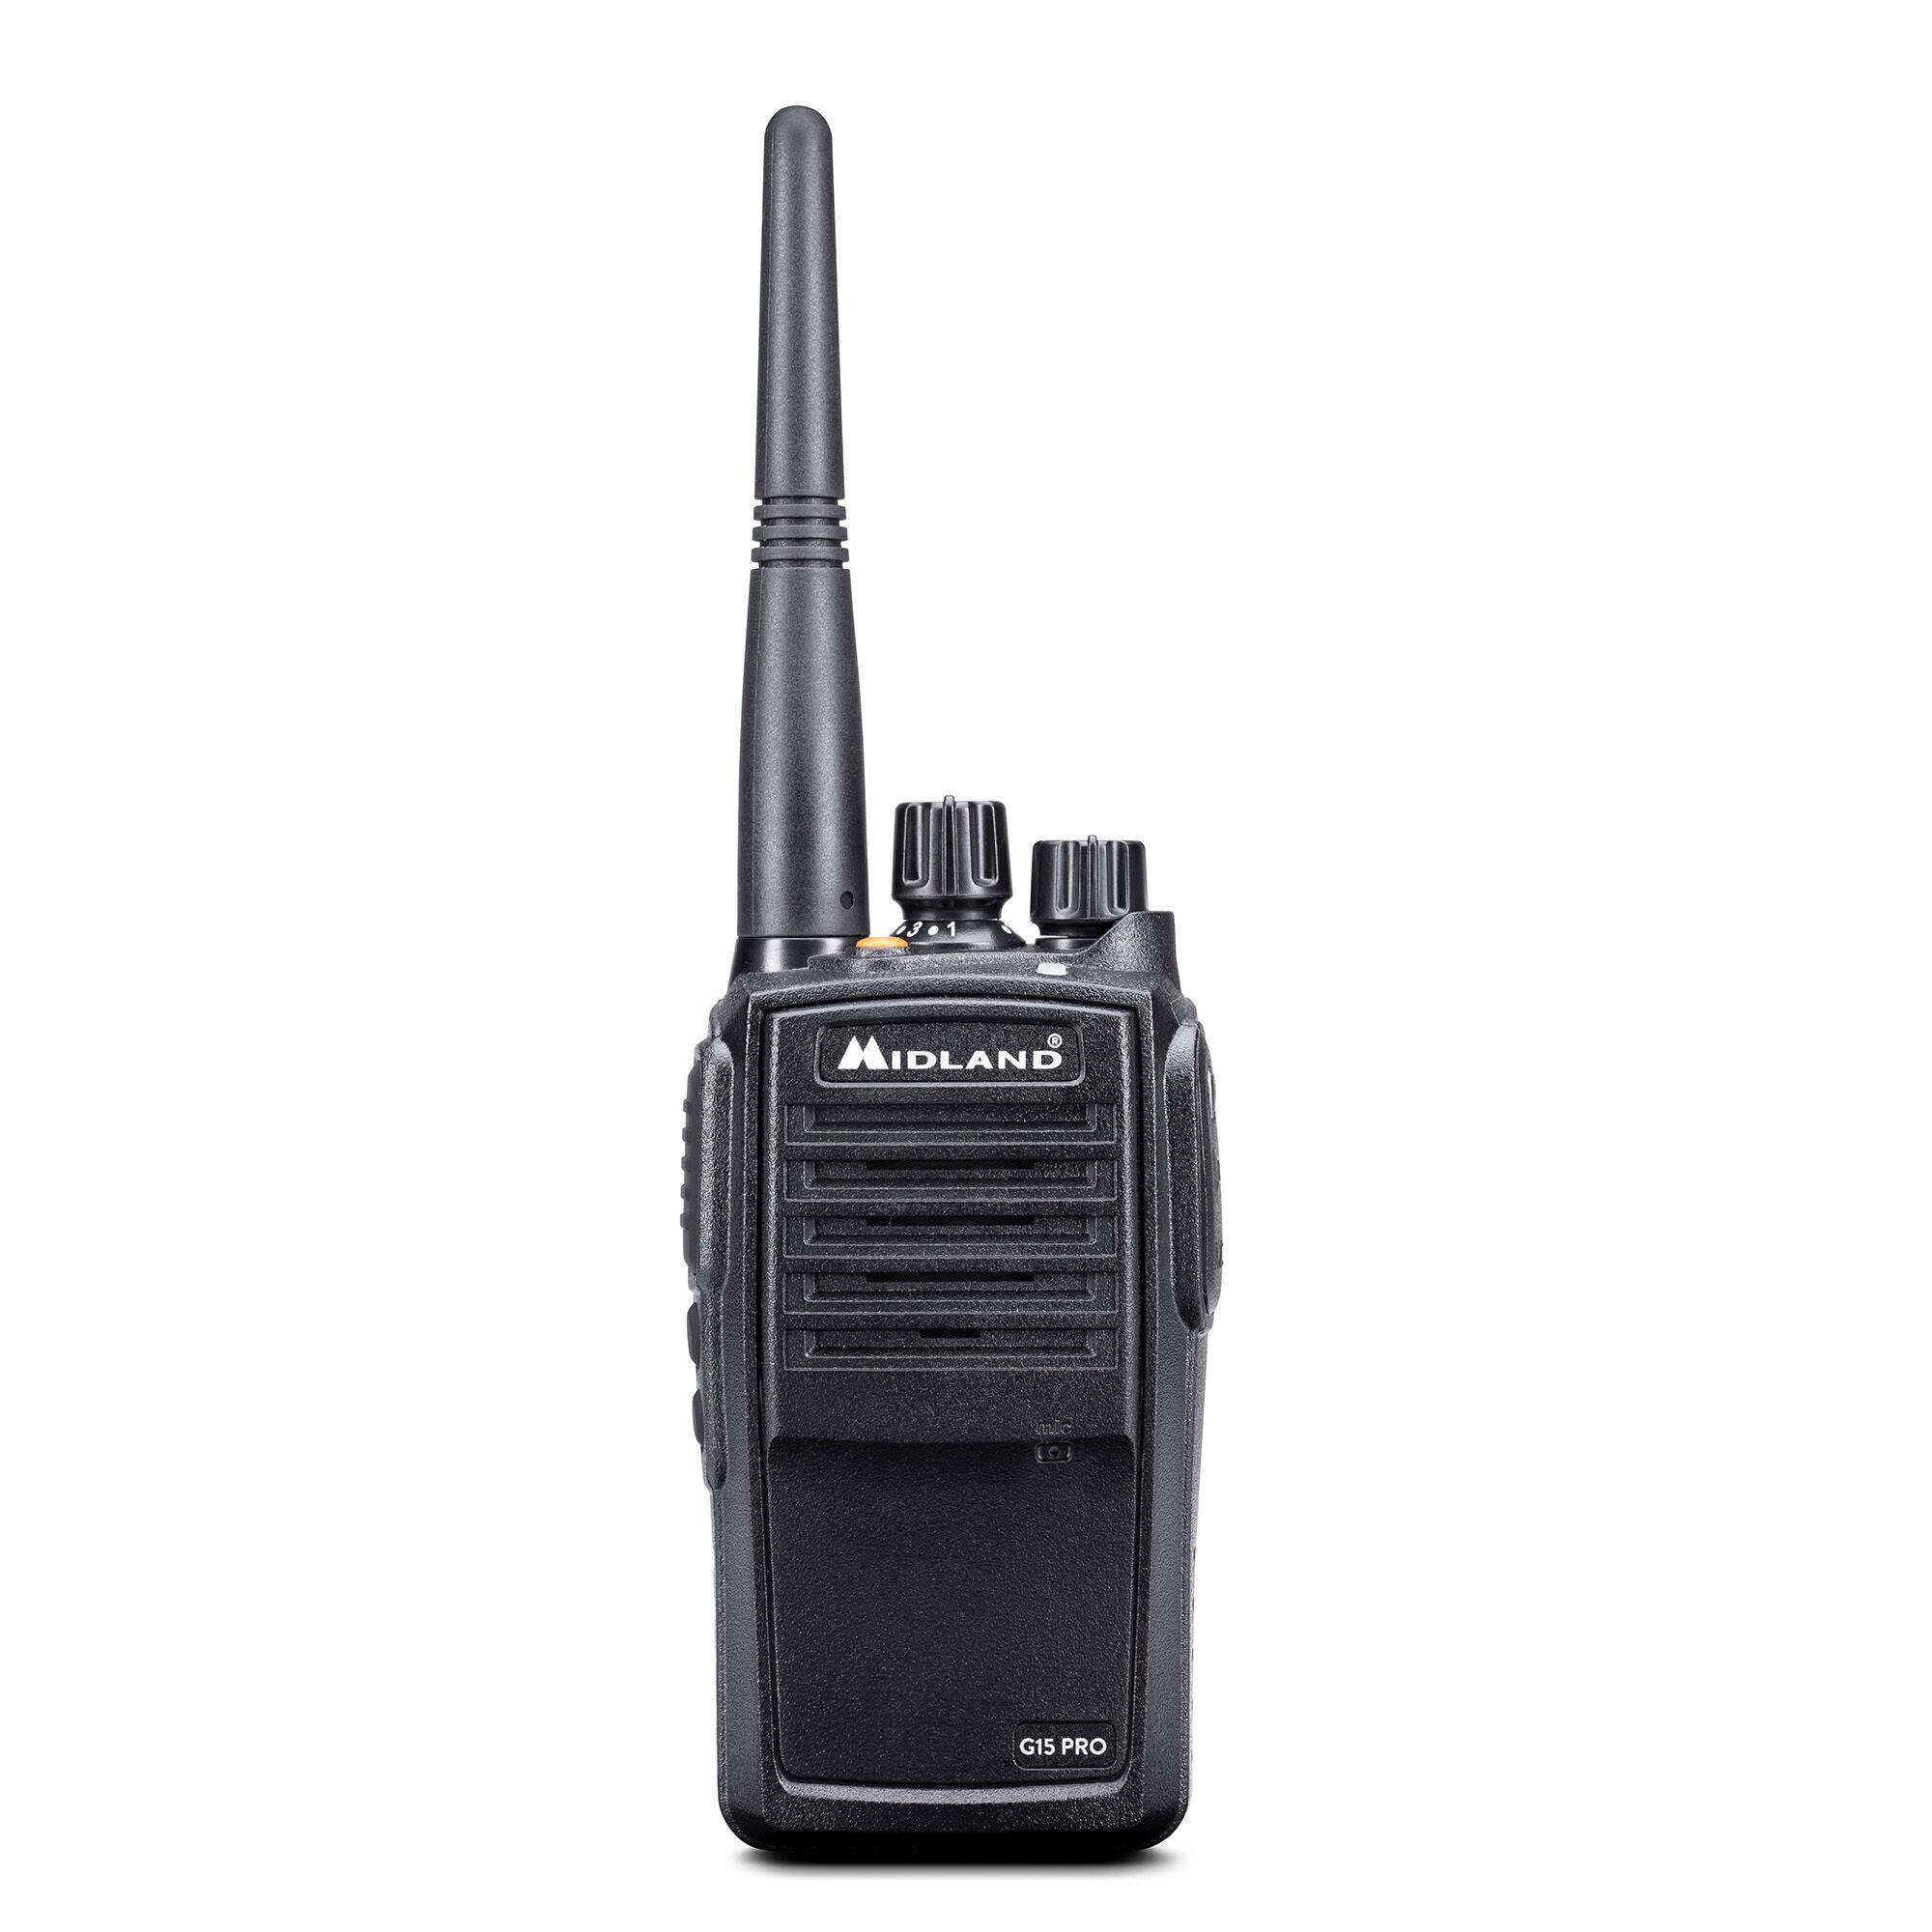 Fotografie Statie radio PMR portabila Midland G15 Pro waterproof IP67 Cod C1127.03